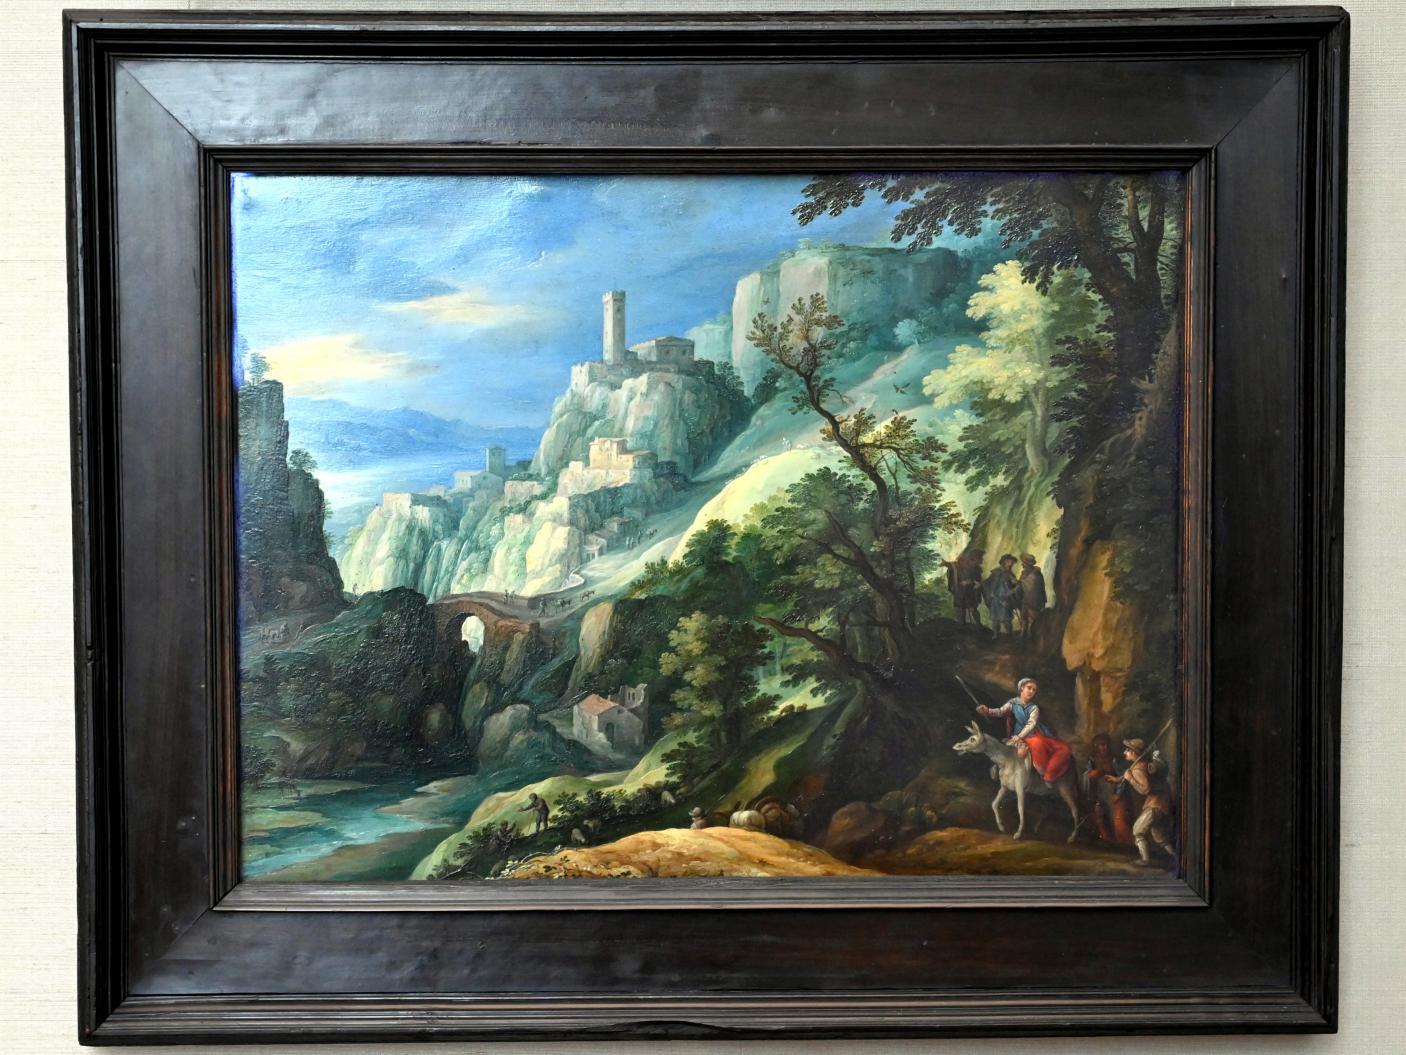 Paul Bril: Italienische Gebirgslandschaft mit dem Gang nach Emmaus, 1603 - 1605